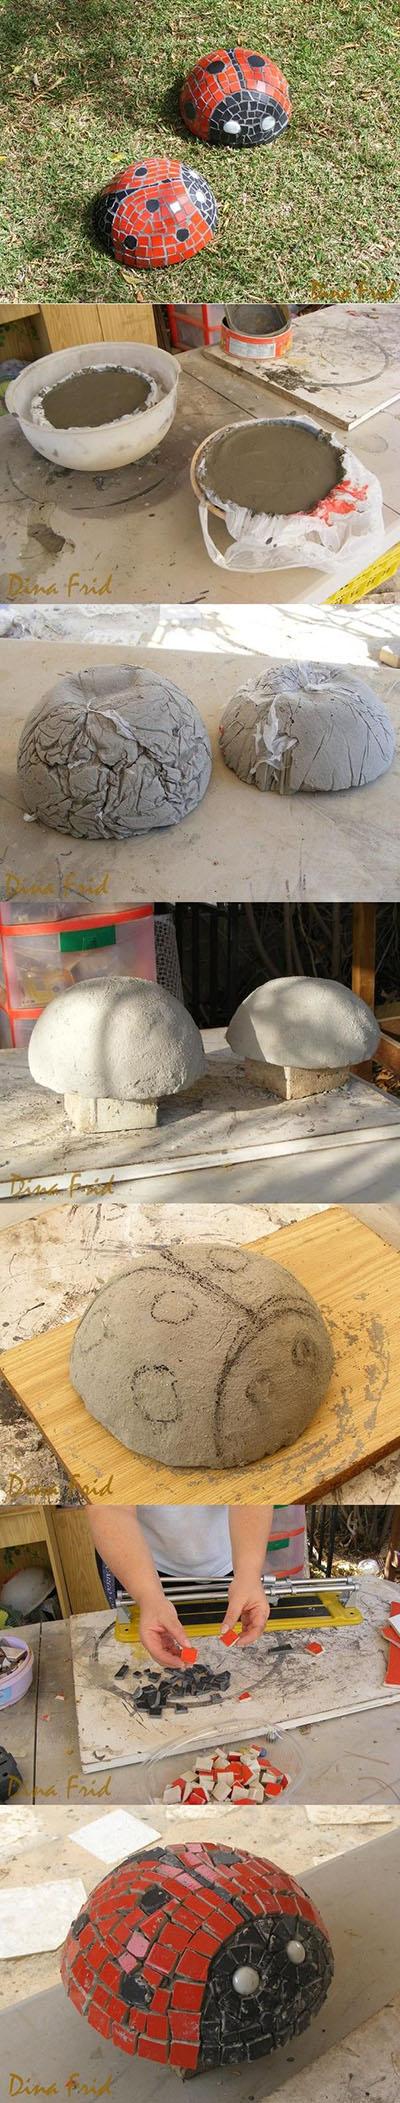 14 DIY Concrete Ladybug Tutorial 771cc1fa1